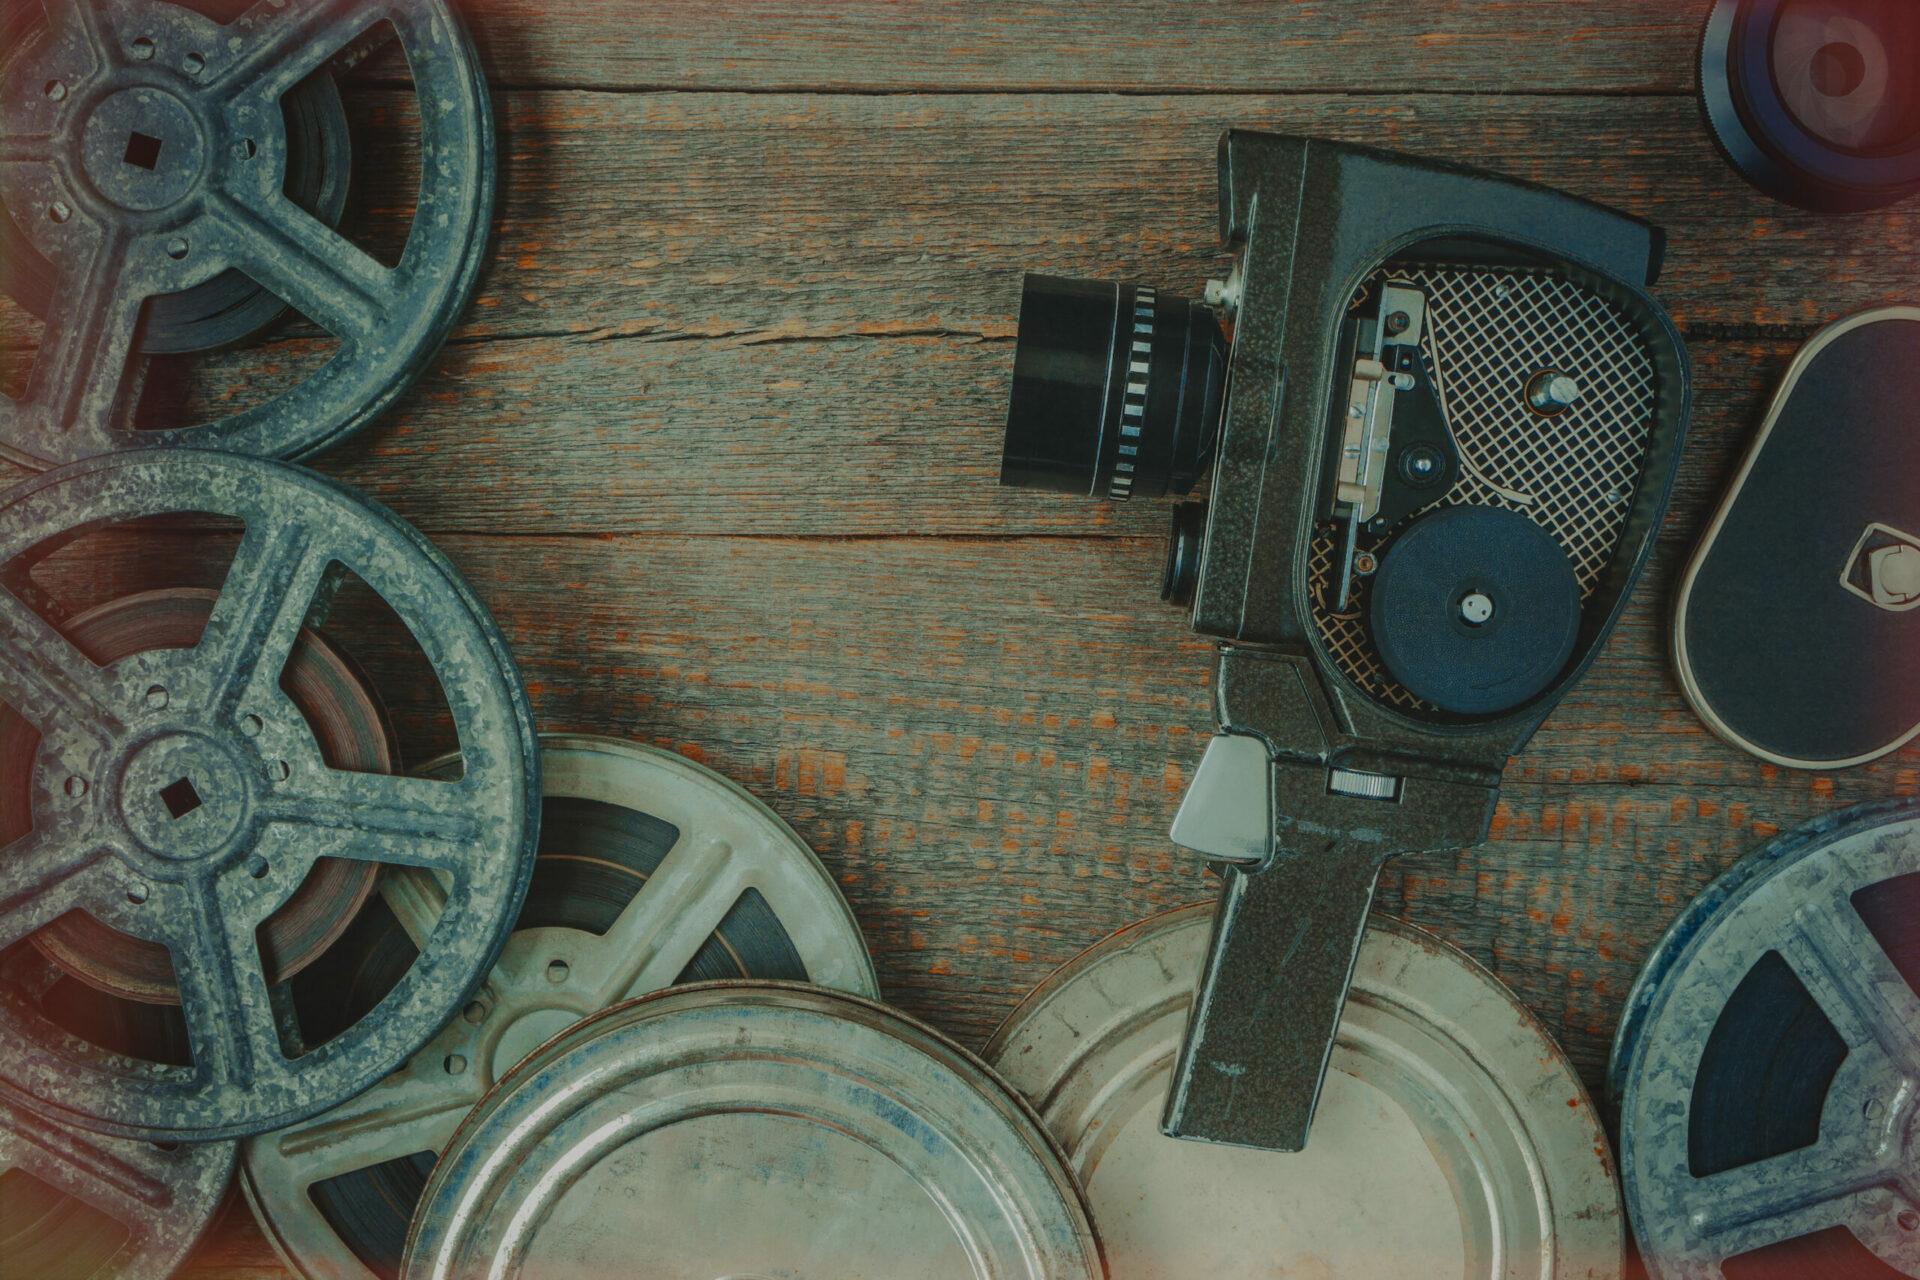 Ancienne caméra et bobine de film